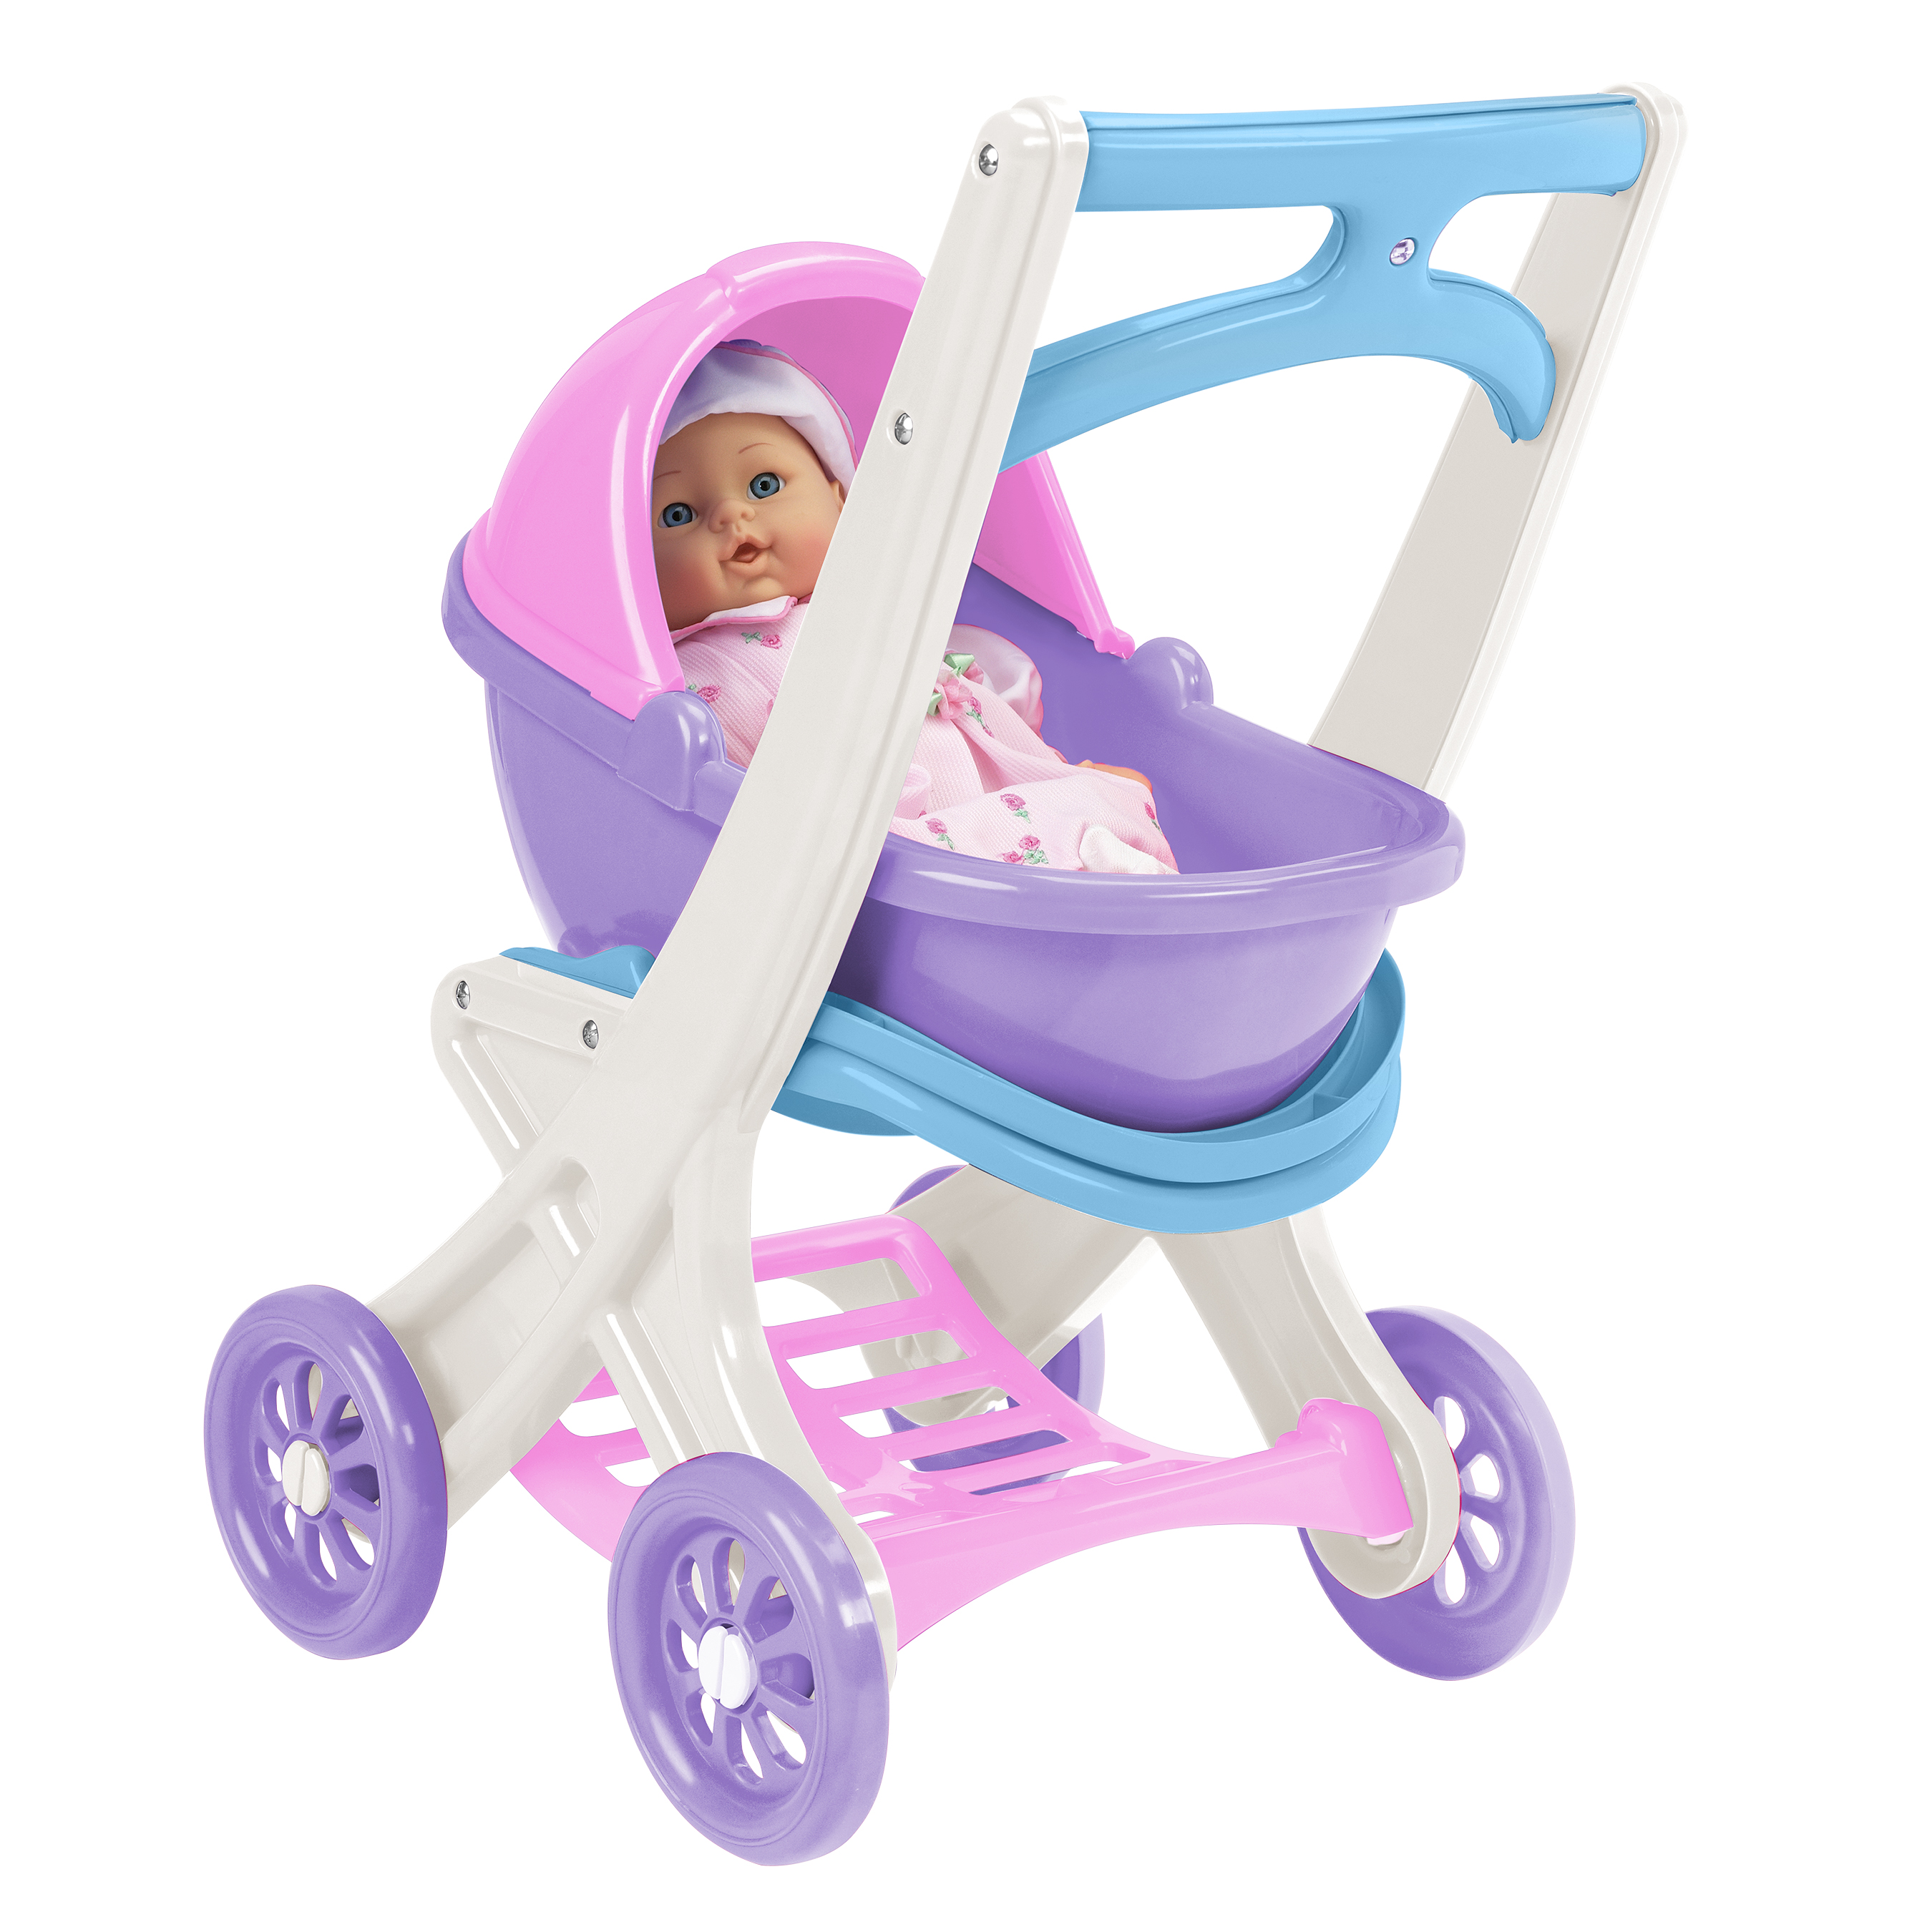 American Plastic Toys On-the-Go Stroller